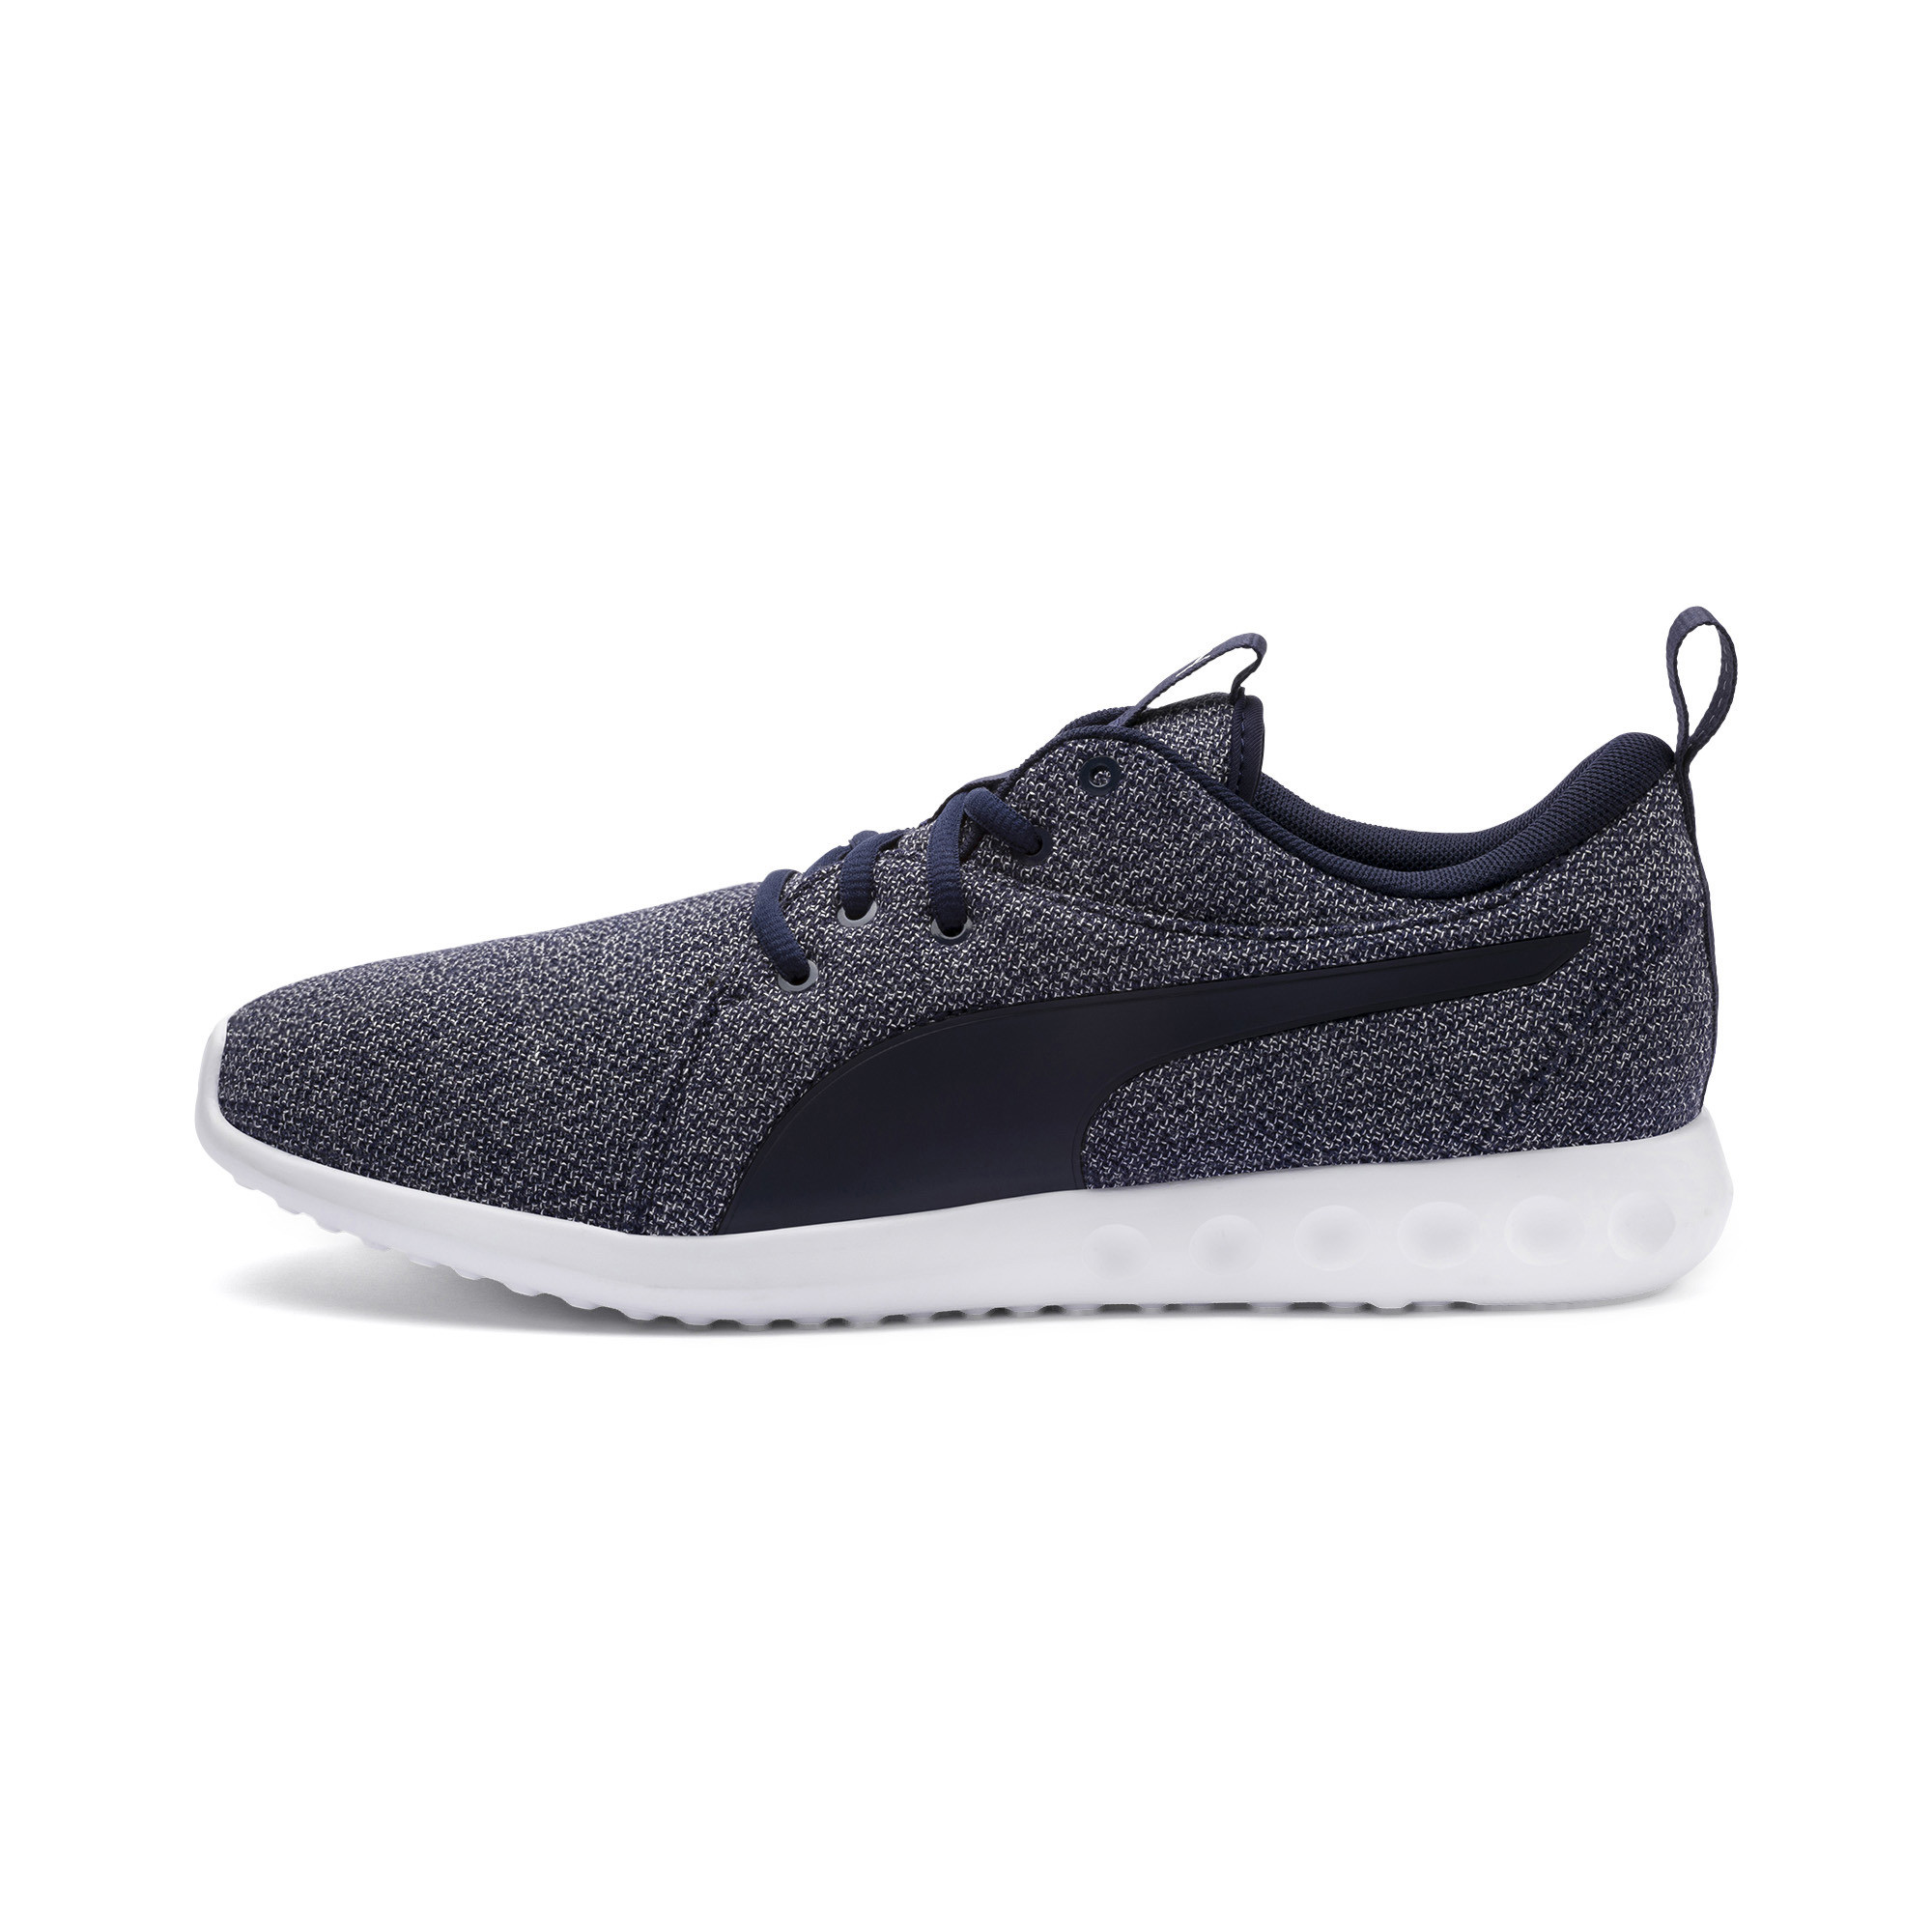 PUMA-Carson-2-Knit-Men-039-s-Training-Shoes-Men-Shoe-Running thumbnail 16